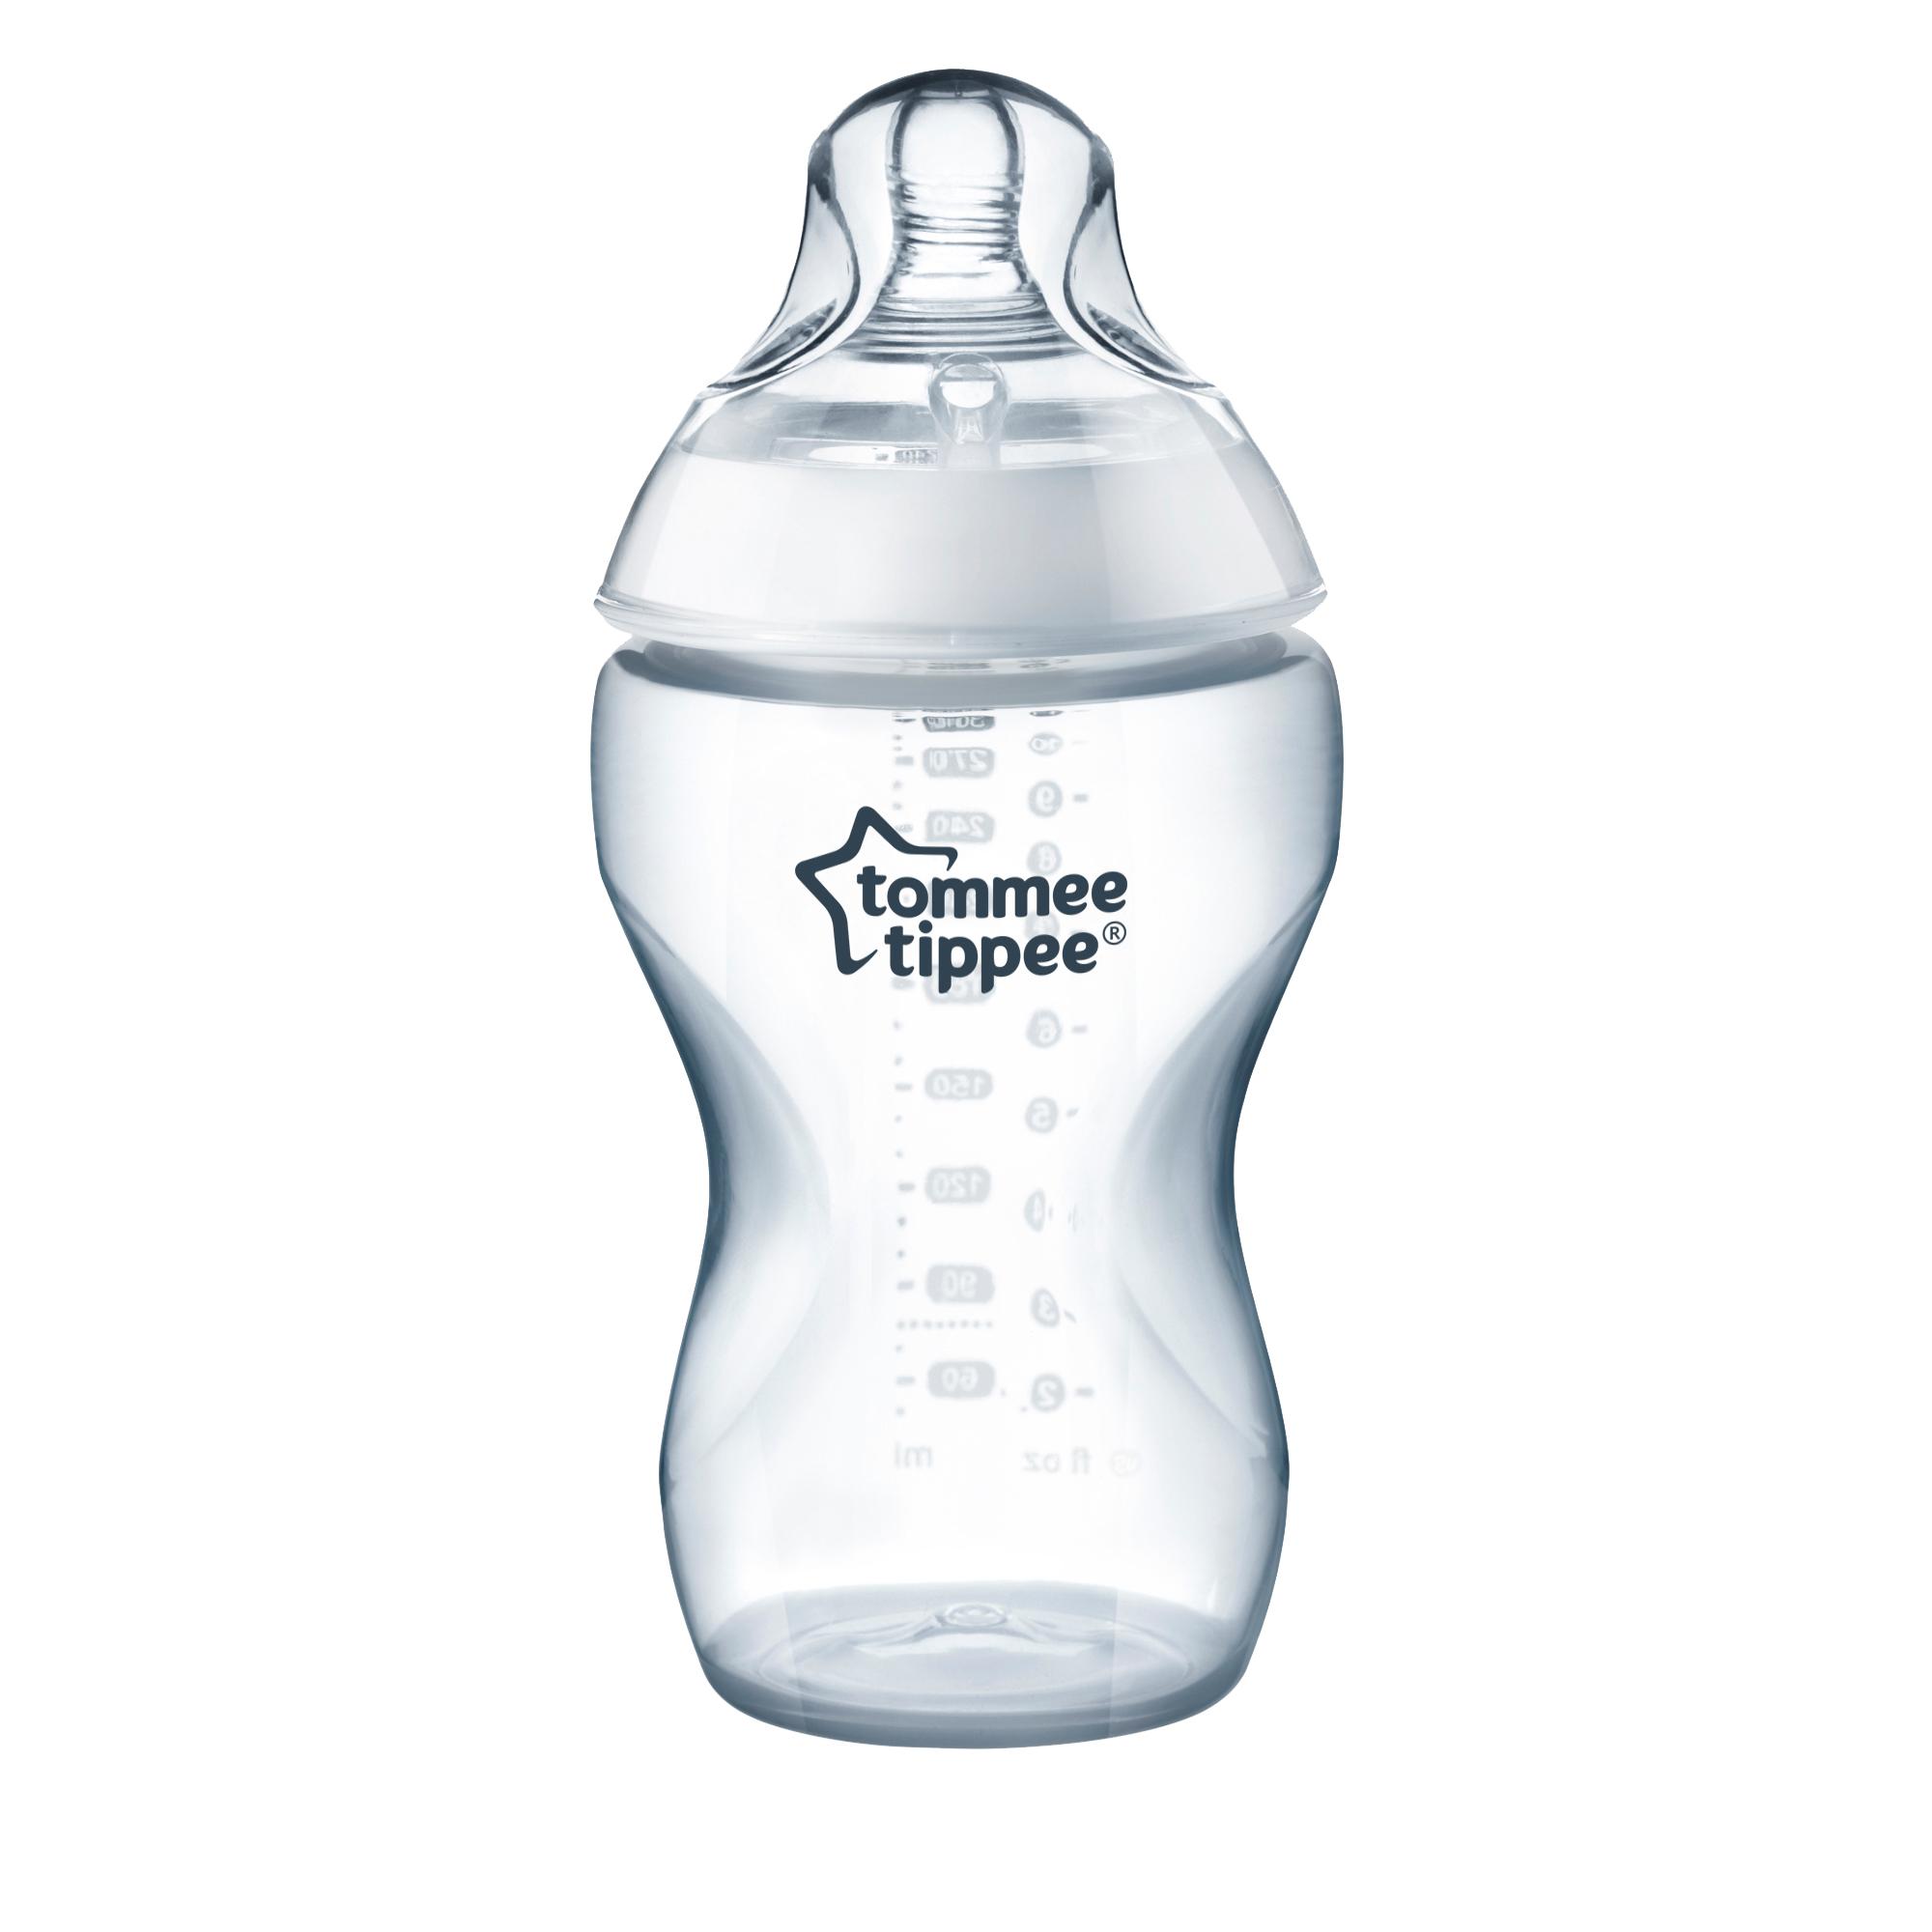 Бутылочки Tommee Tippee Бутылочка Tommee Tippee средний поток 340 мл бутылочки для кормления tommee tippee медленный поток 3 шт 260 мл